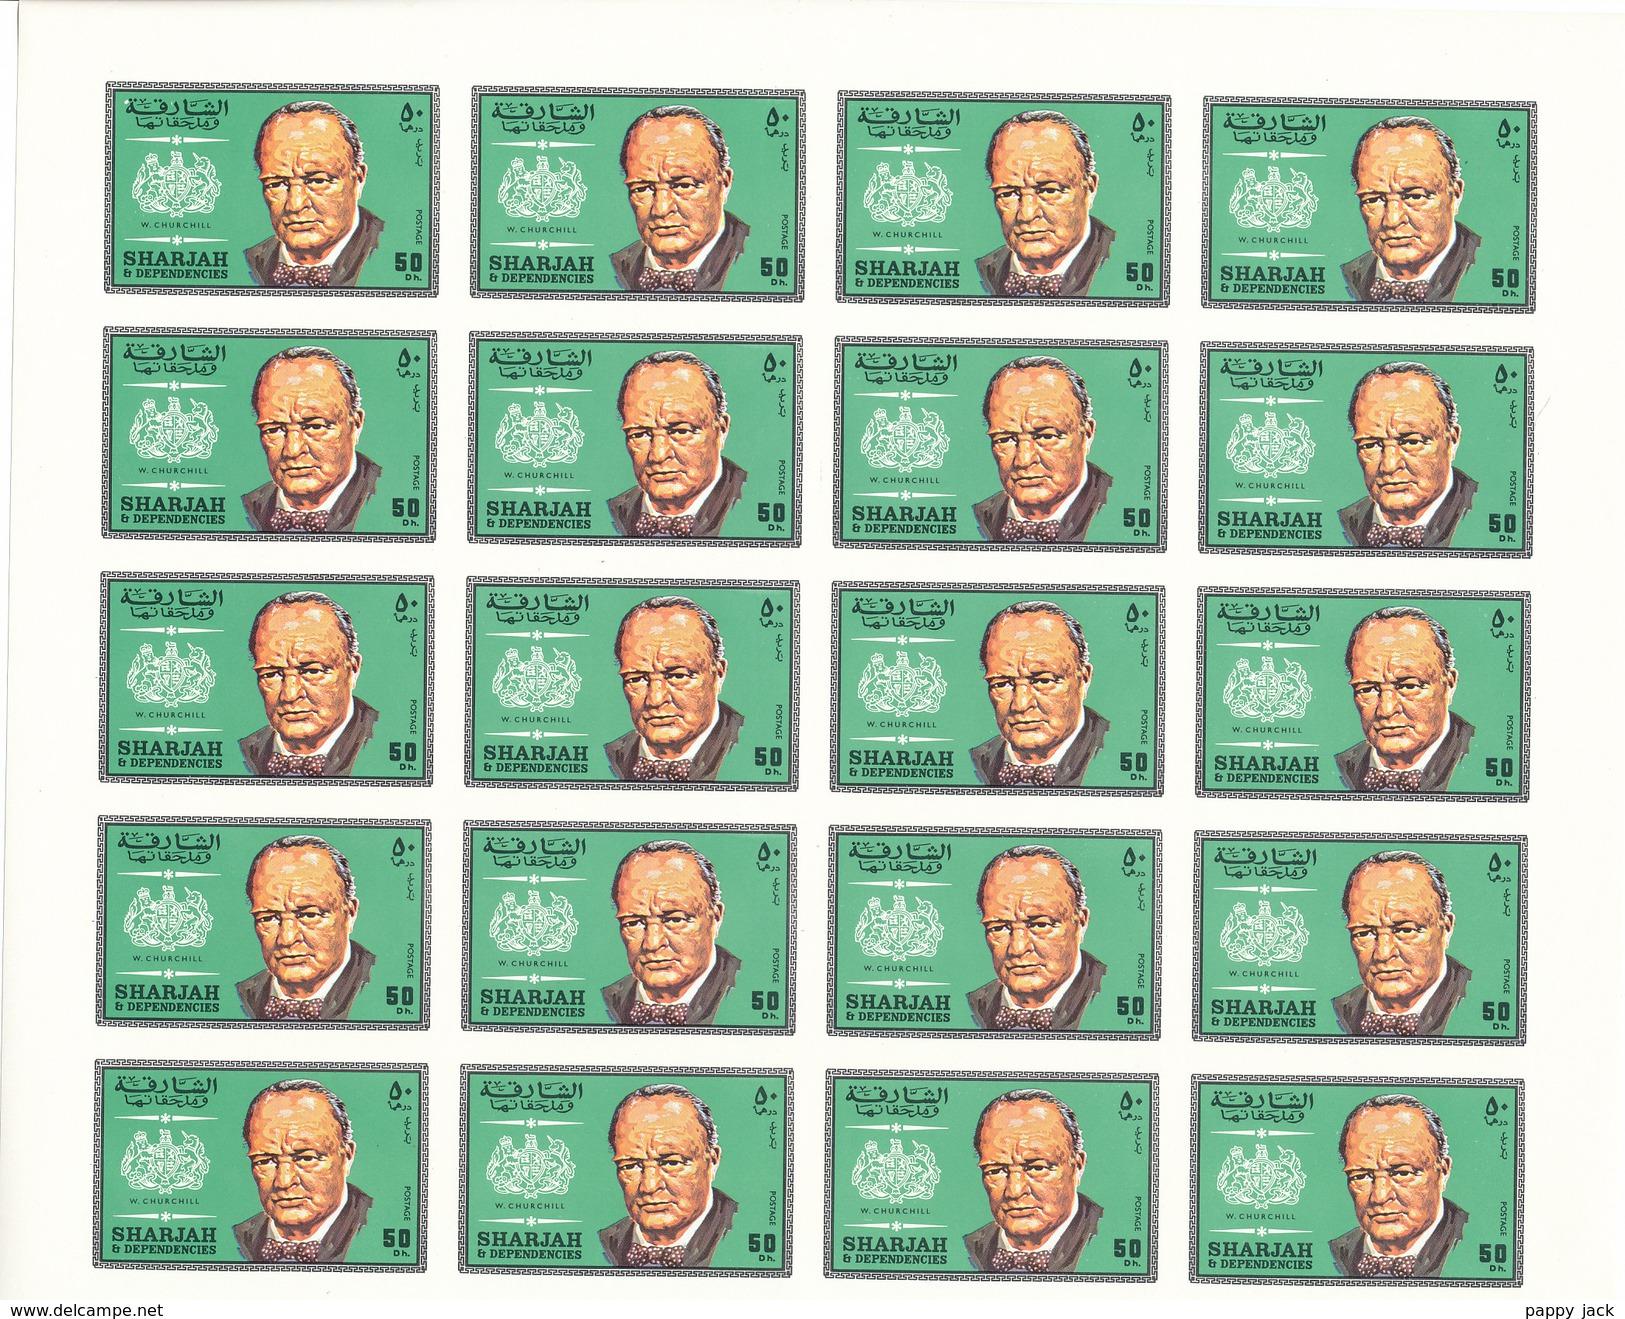 SHARJAH  Full Sheet IMPERF  4 X 5 Churchill Stamps  MNH - Sir Winston Churchill